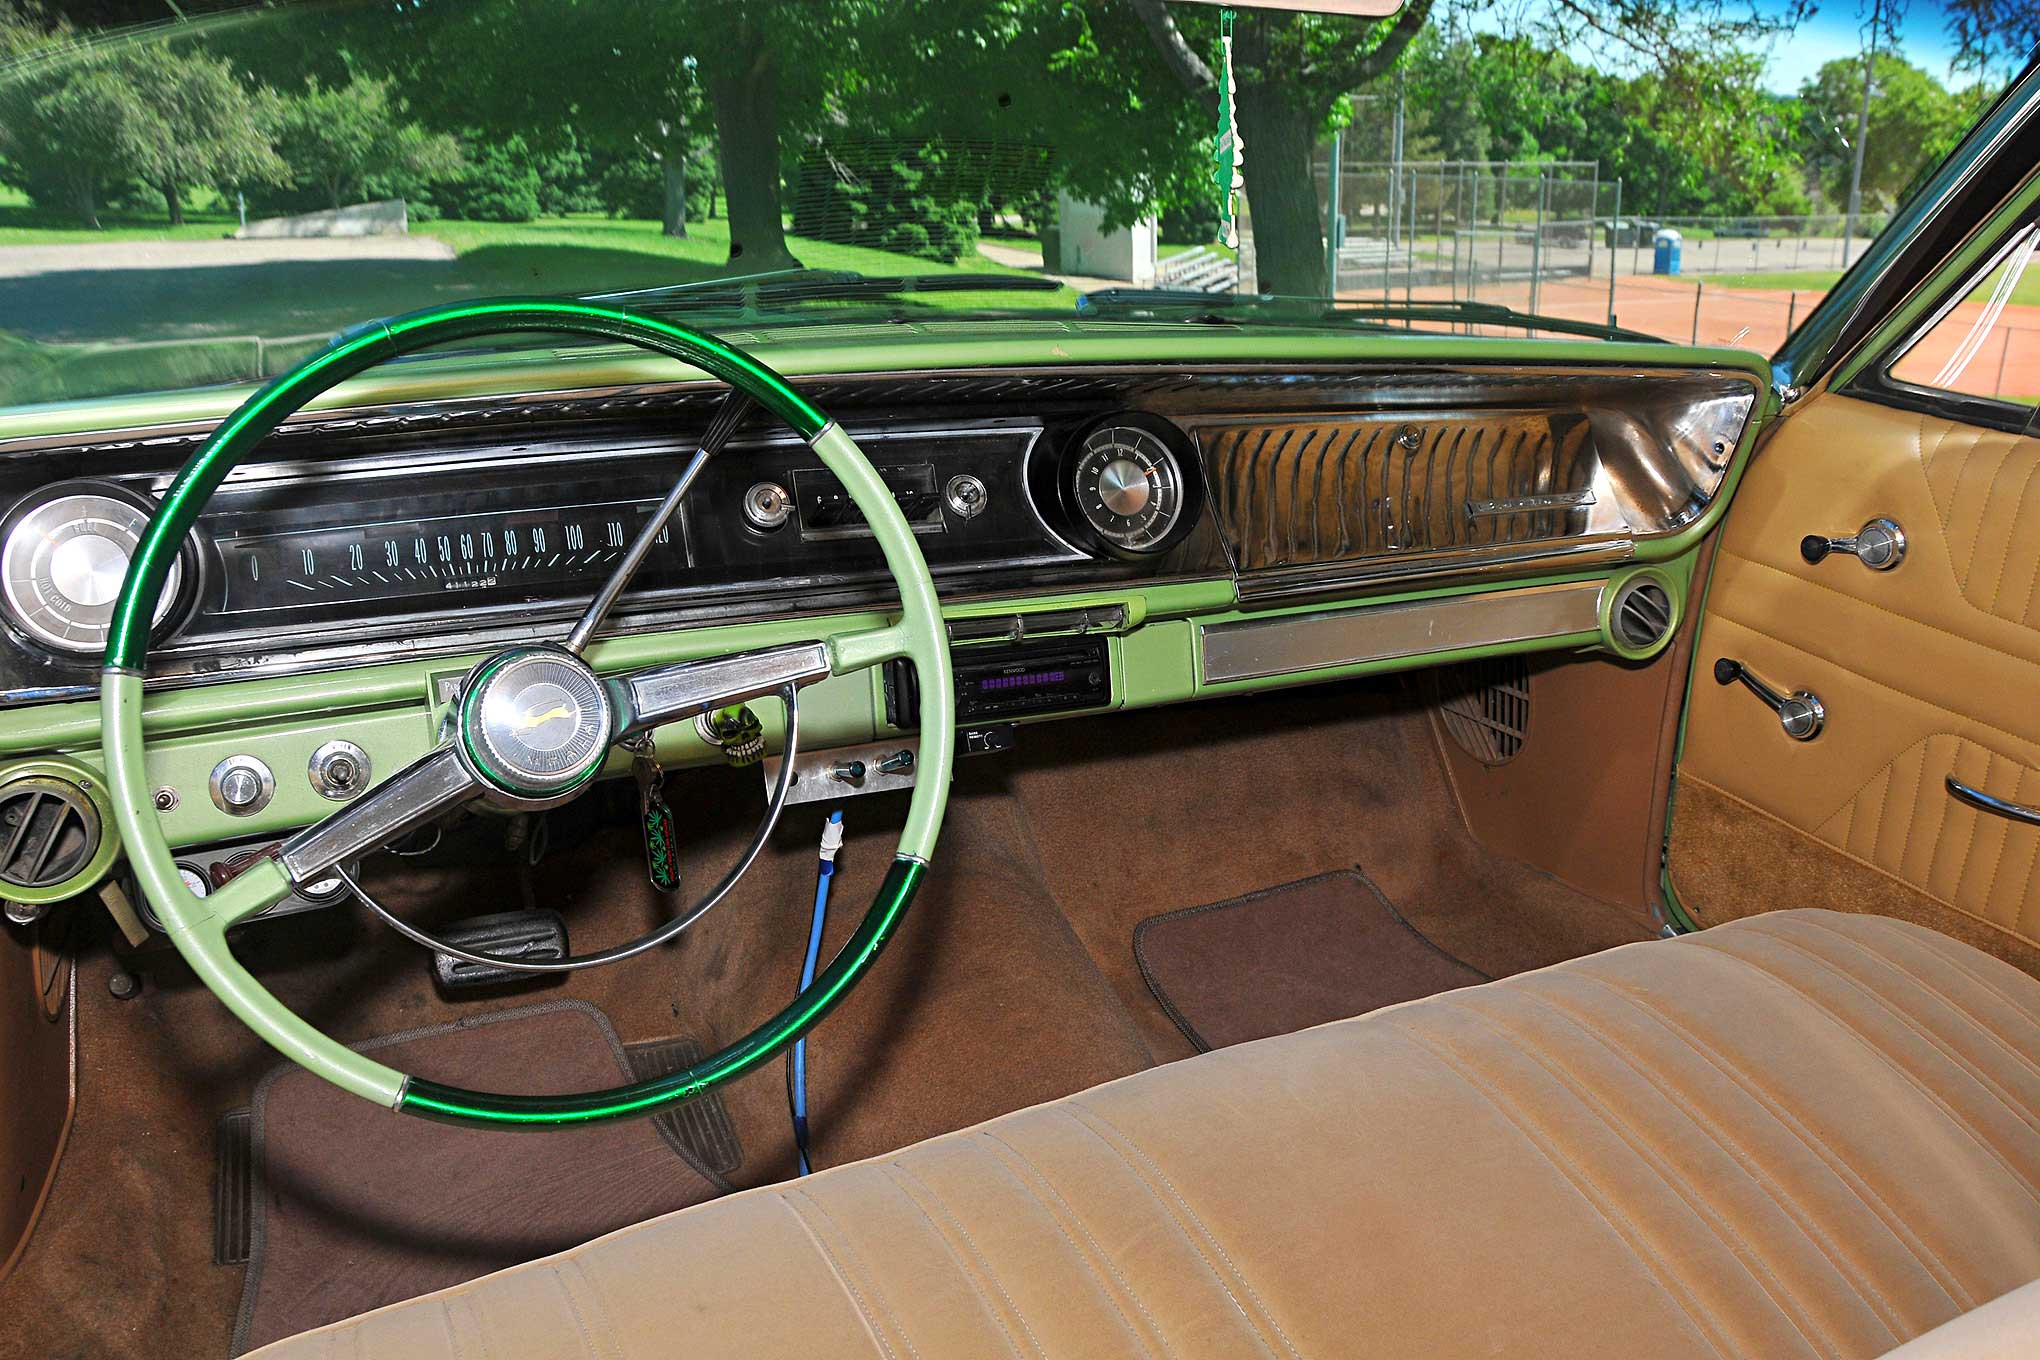 1965 Chevrolet Impala Wagon Space Invader